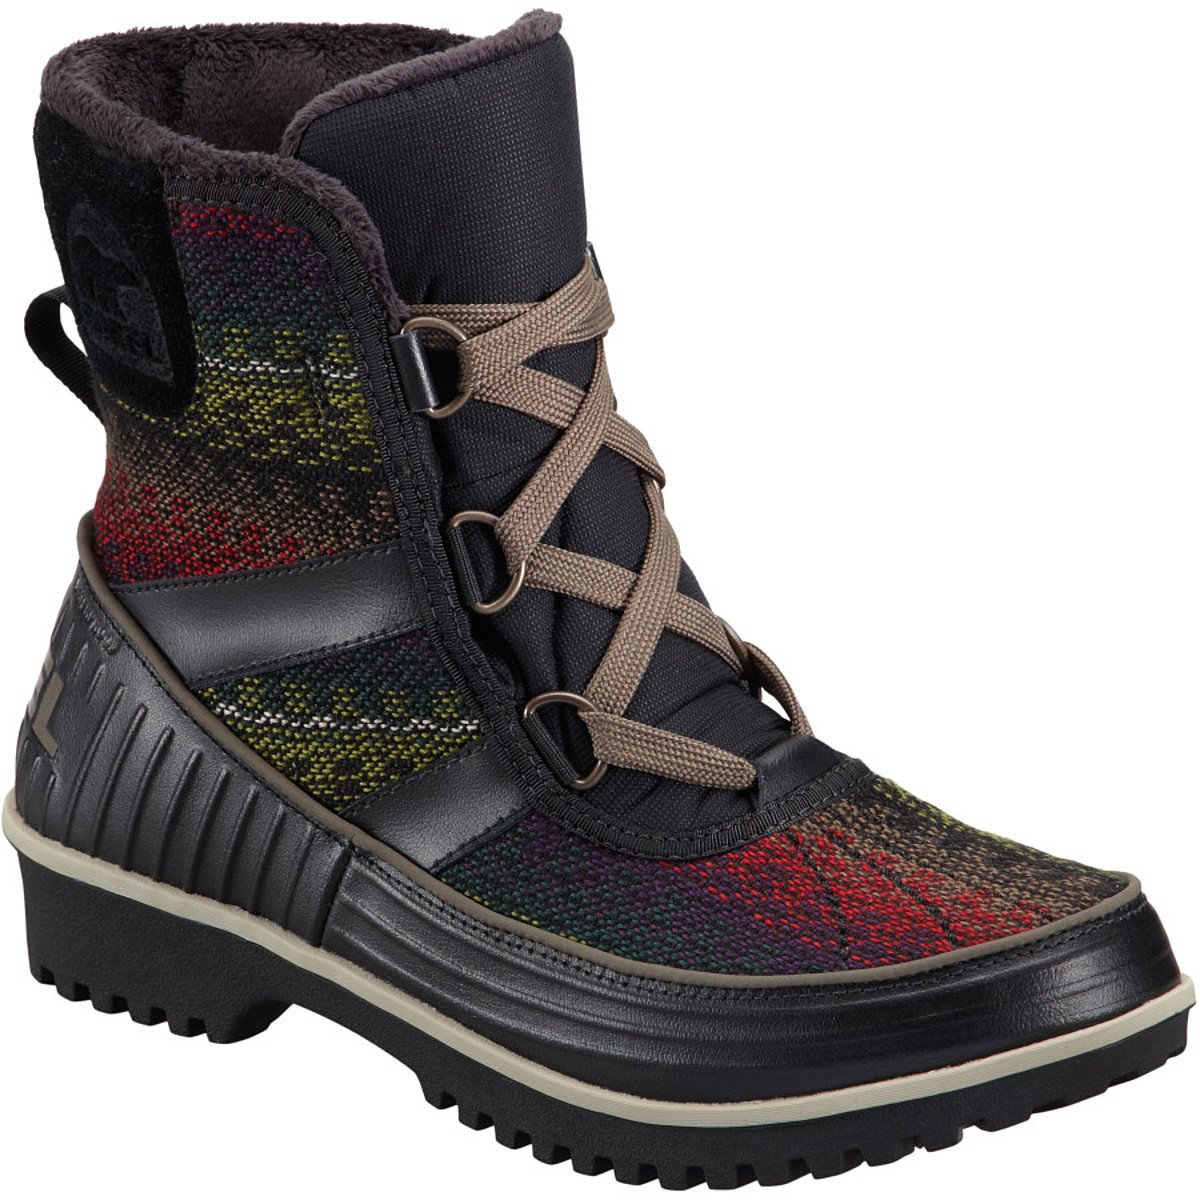 Sorel Tivoli II Boot - Women's Black, 5.0